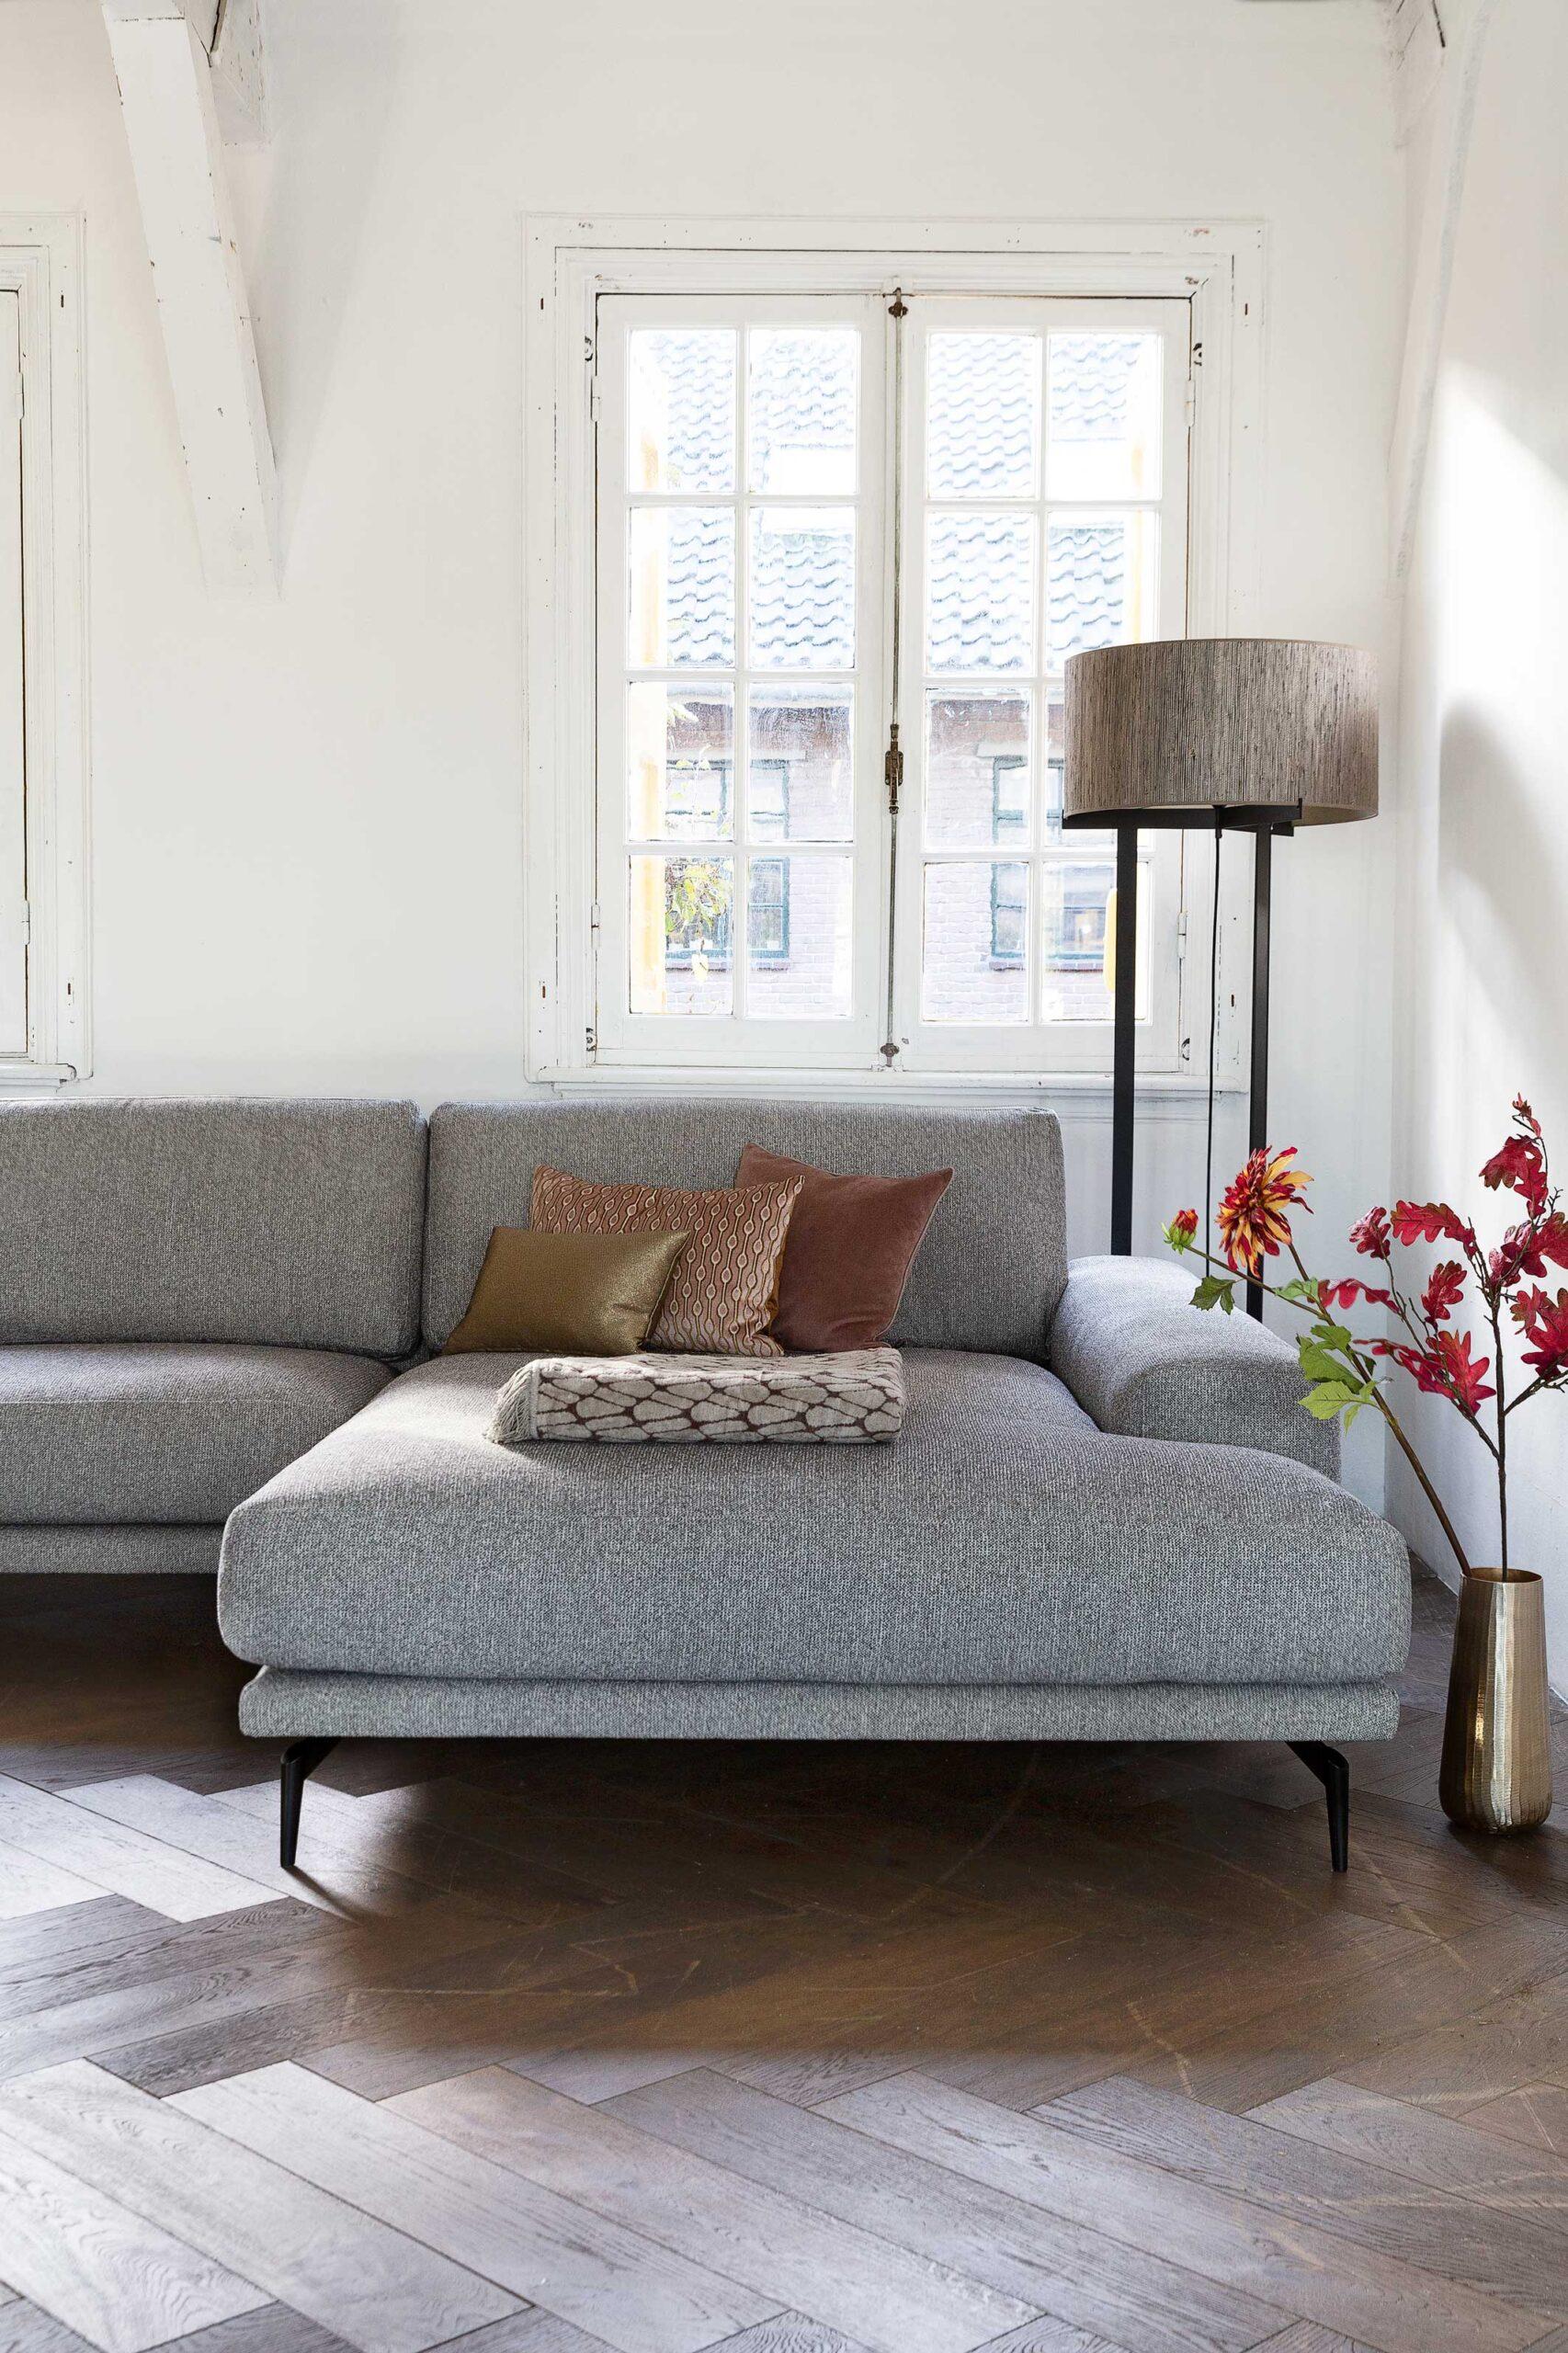 belle-milano-detailfoto-longchair-soofs-interieur